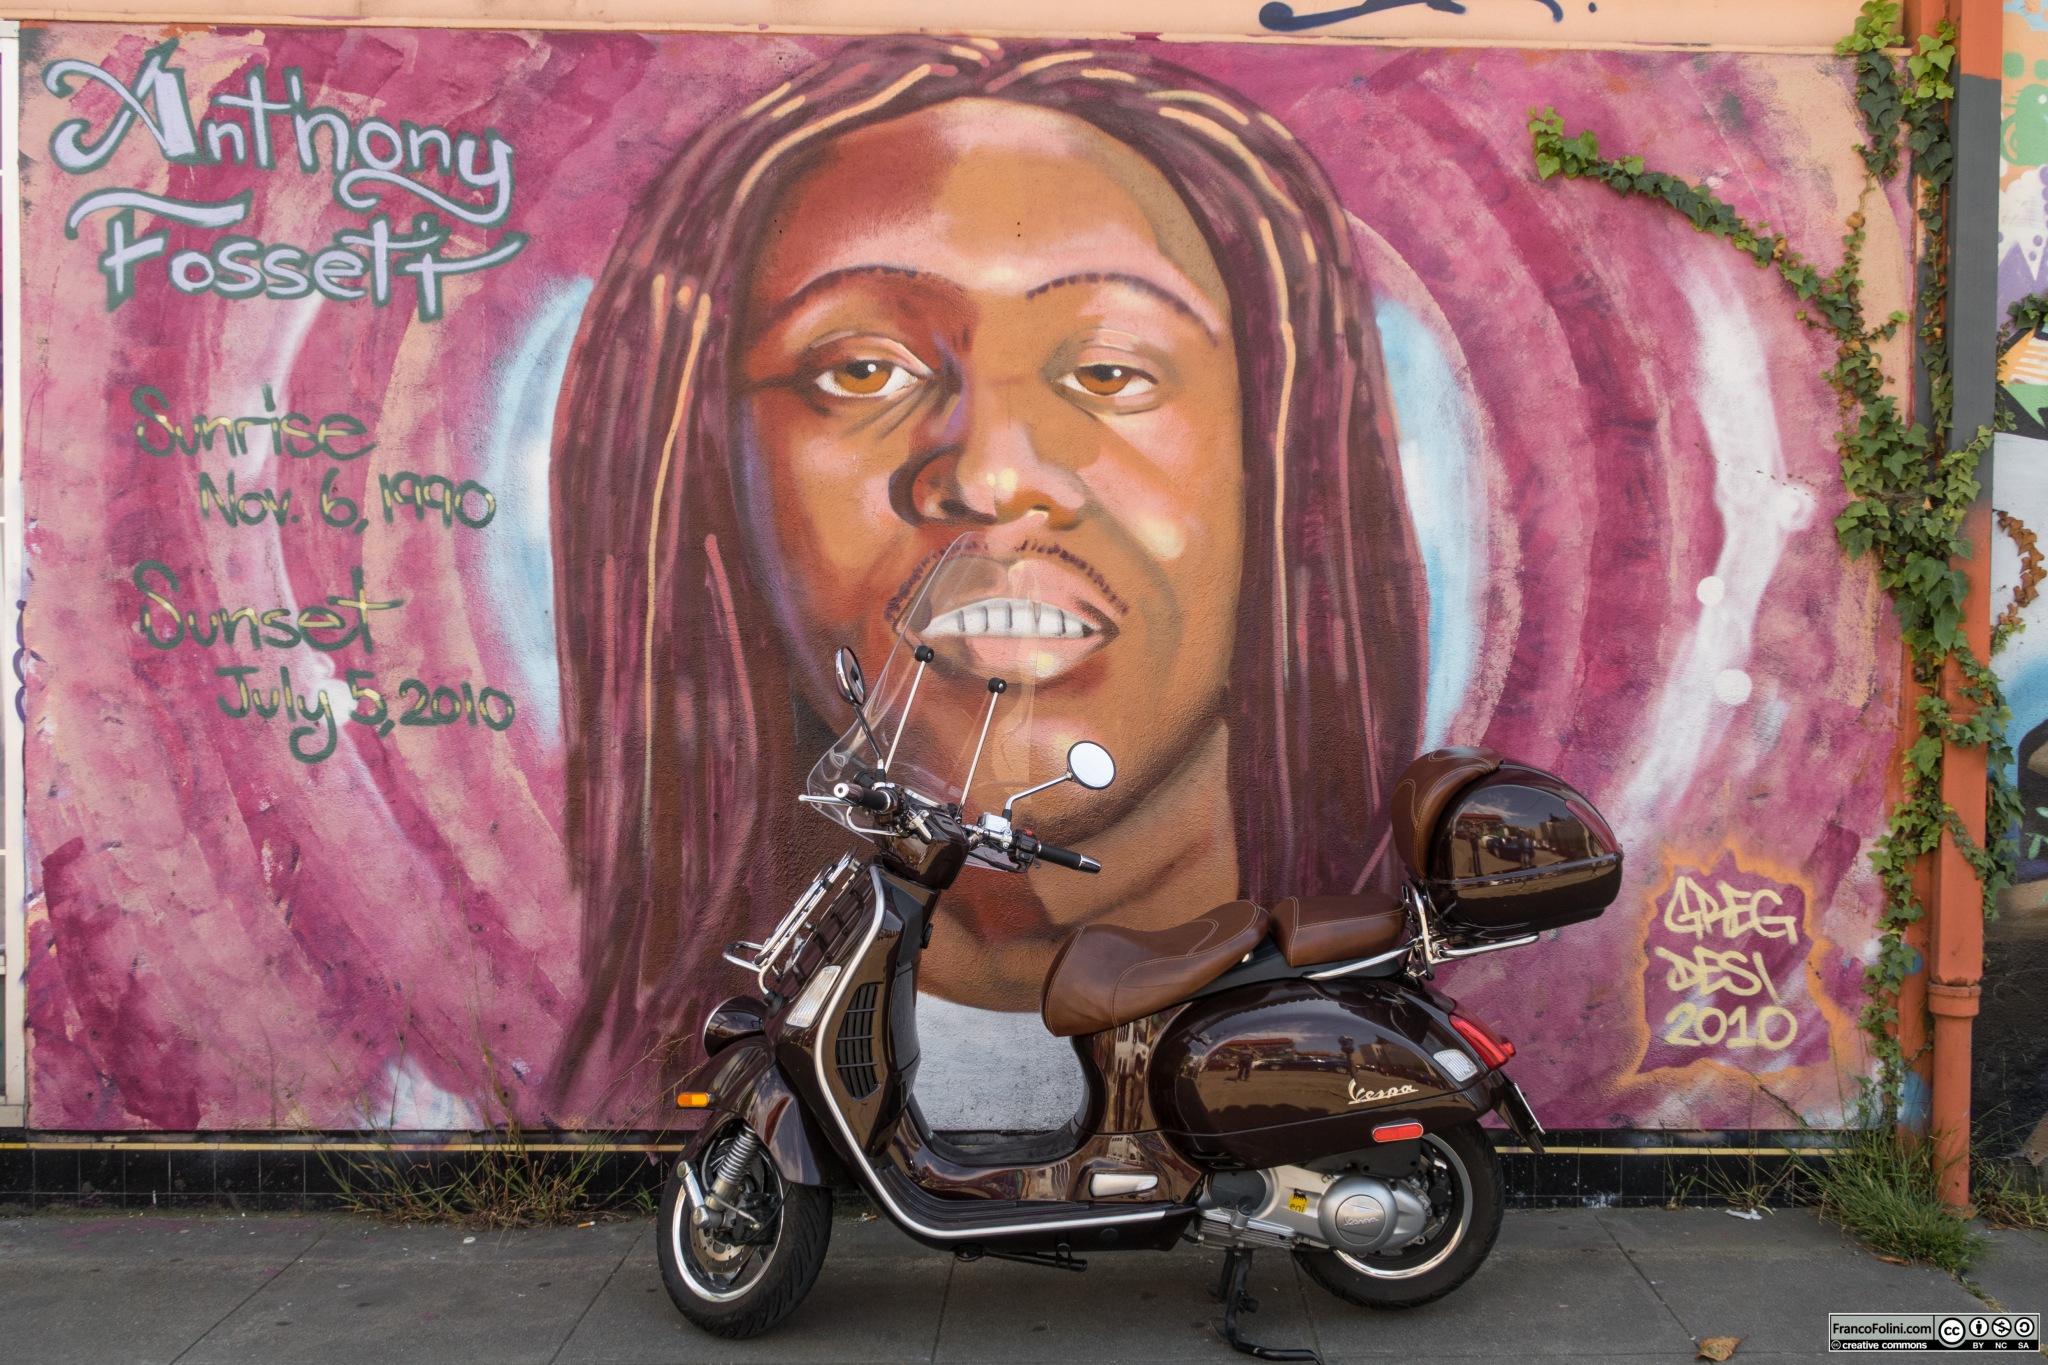 Vespa davanti a murale dedicato ad Anthony Lehman Fossett